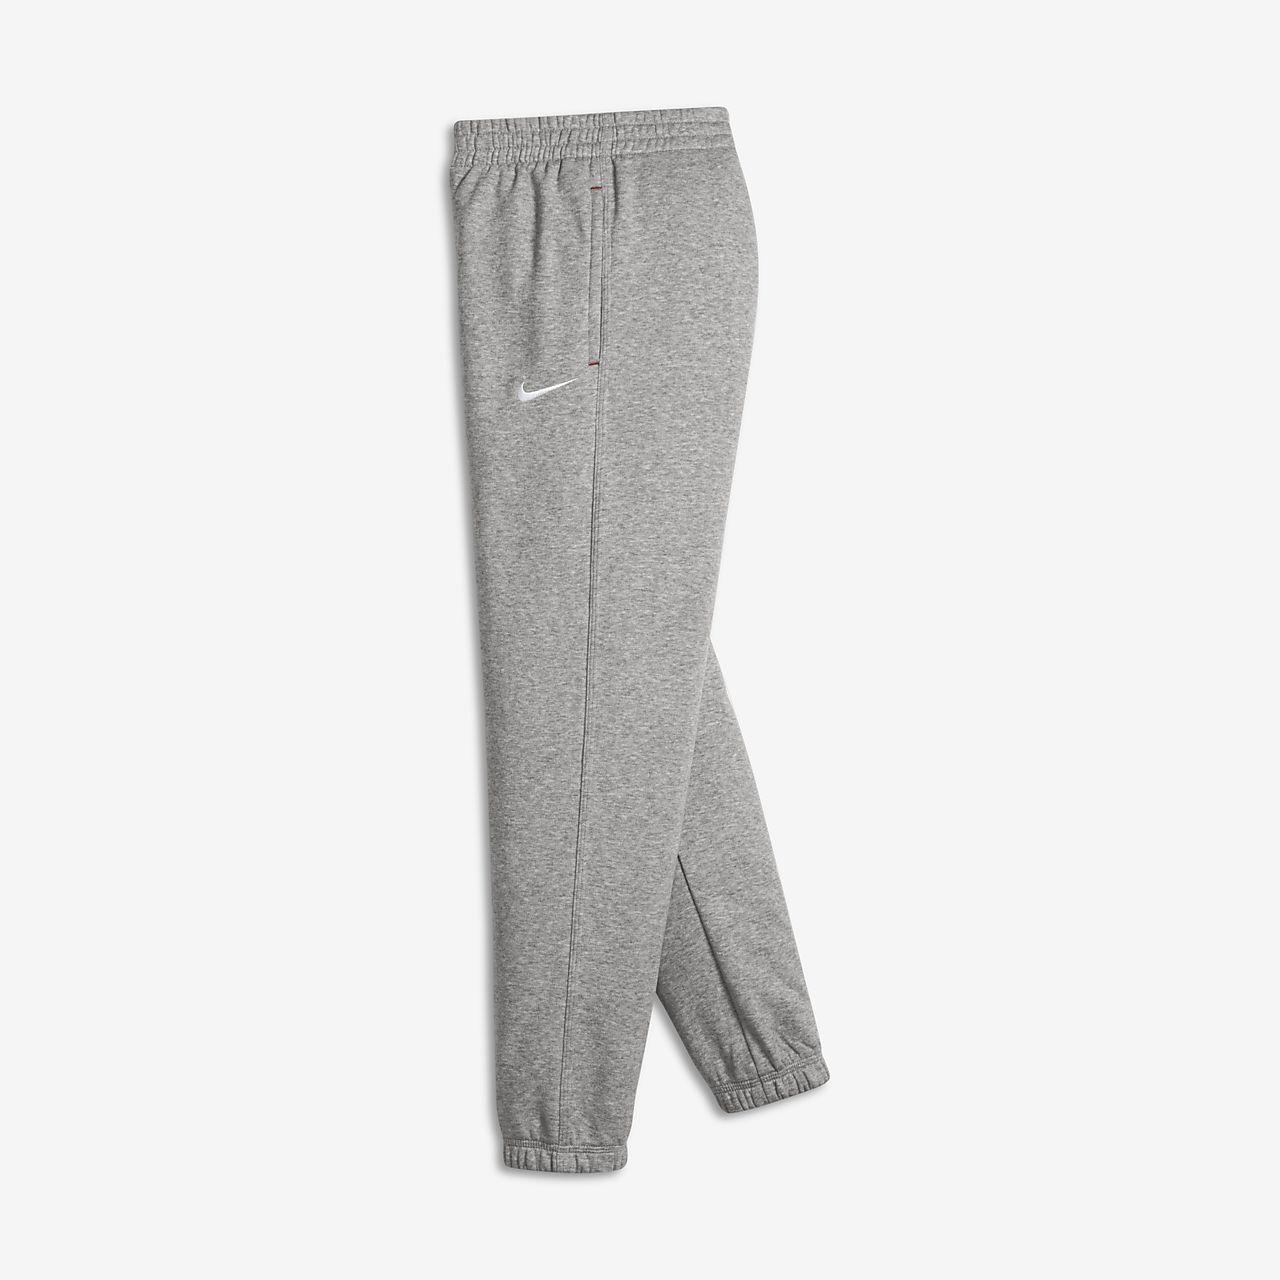 Pantalon de survêtement Nike Brushed-Fleece Cuffed pour Garçon